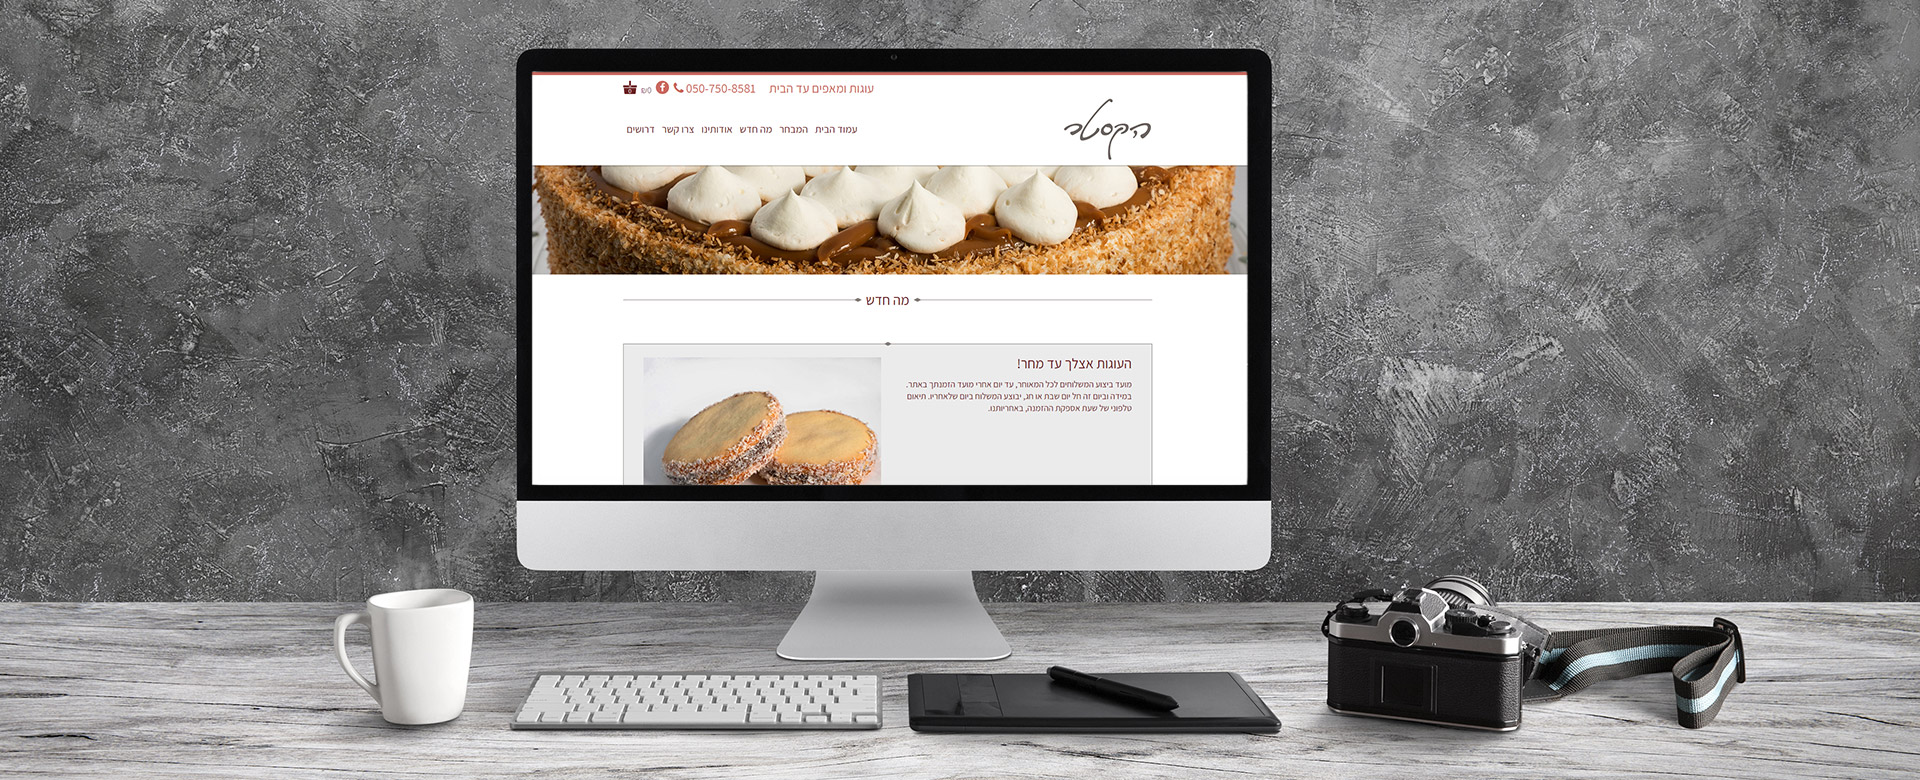 Hexter website